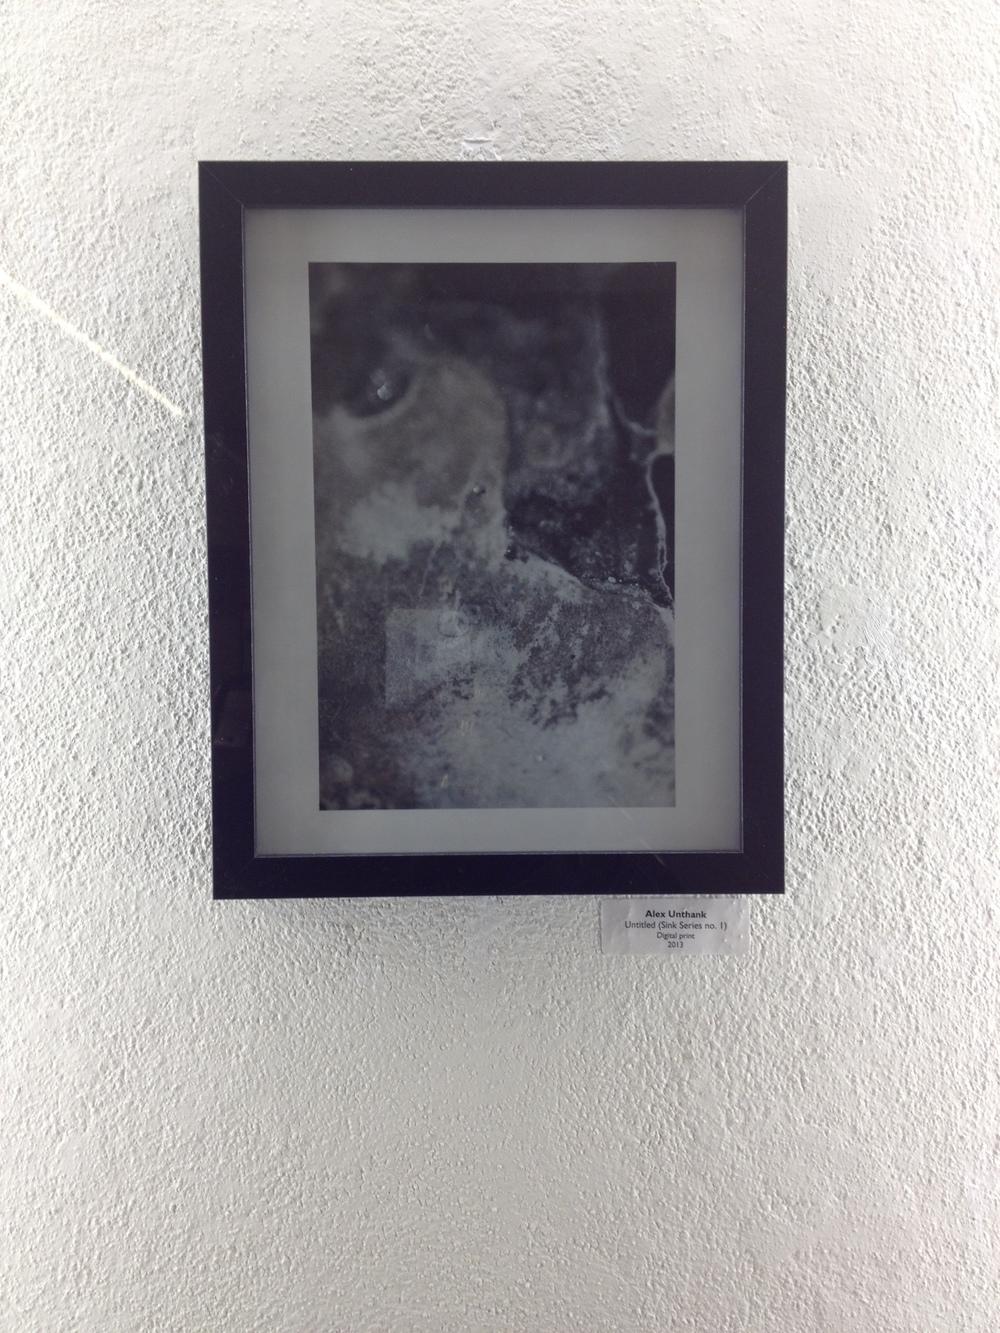 photo 3-1.JPG